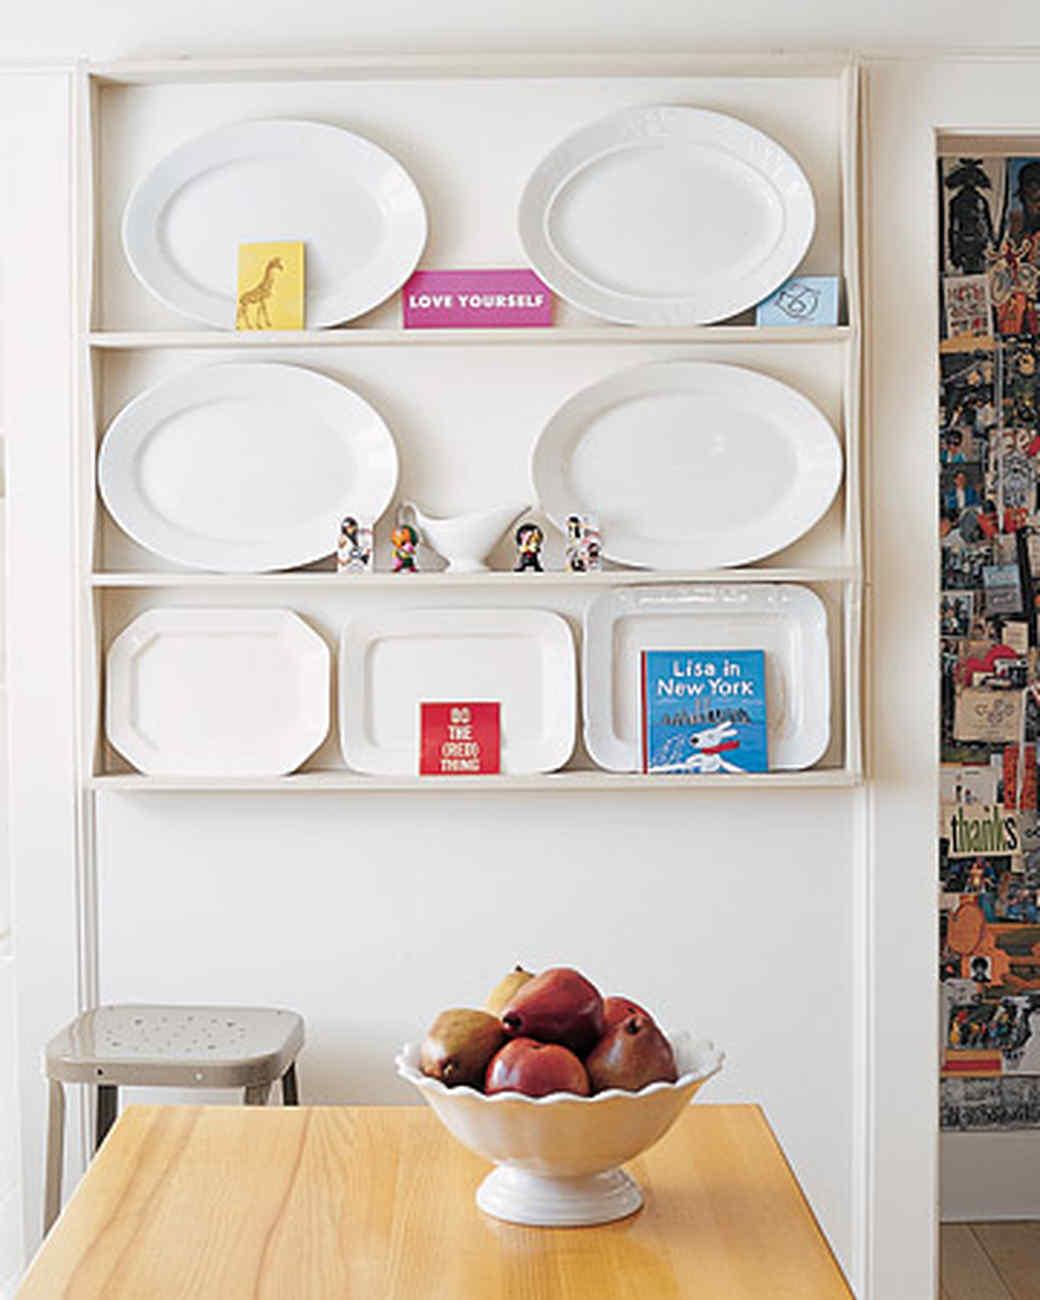 mla103122_0907_plates.jpg